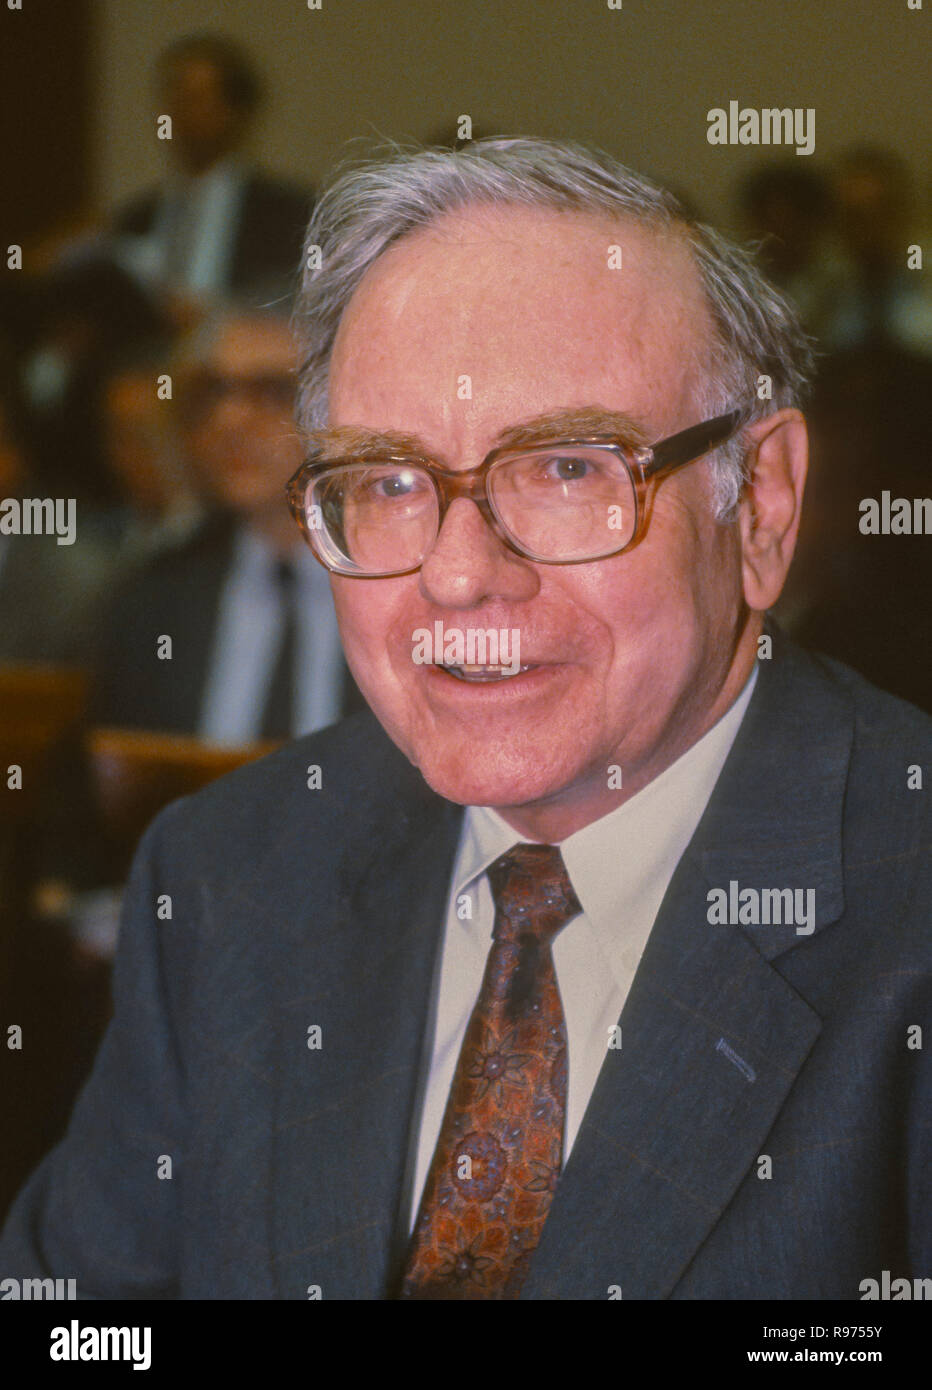 WASHINGTON, DC, USA - SEPTEMBER 4, 1991: Warren Buffett, Chairman Salomon Brothers, appears before U.S. House Subcmte. on Telecommunications. - Stock Image